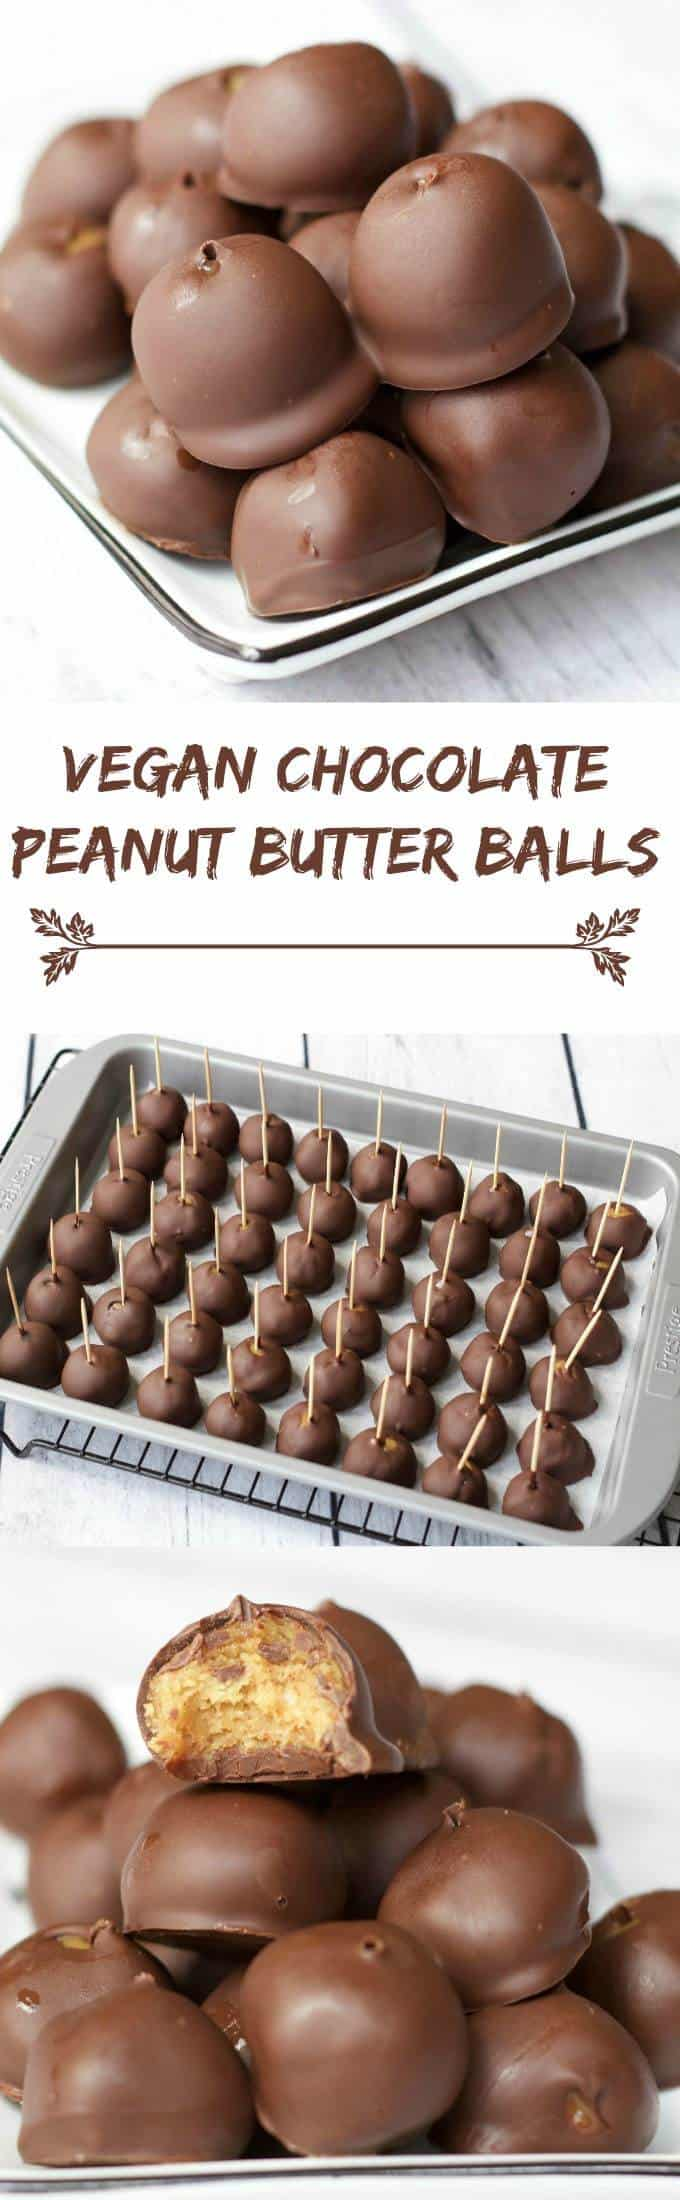 Chocolate Peanut Butter Balls $vegan #glutenfree #dairyfree #lovingitvegan